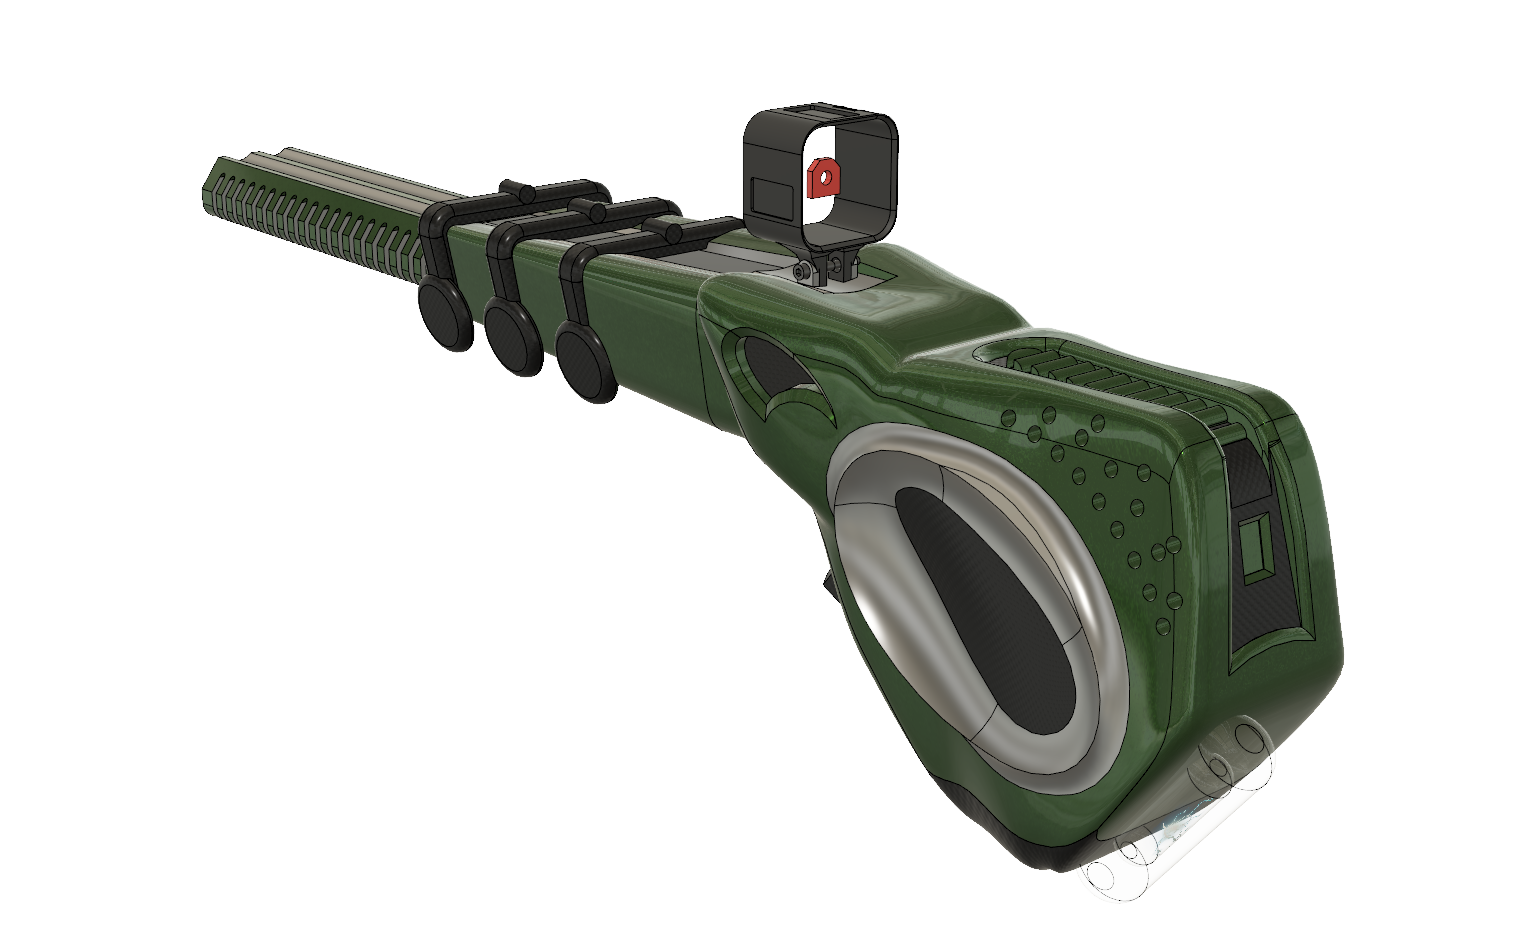 Three D Guns 2 Challenge: CR Replicator